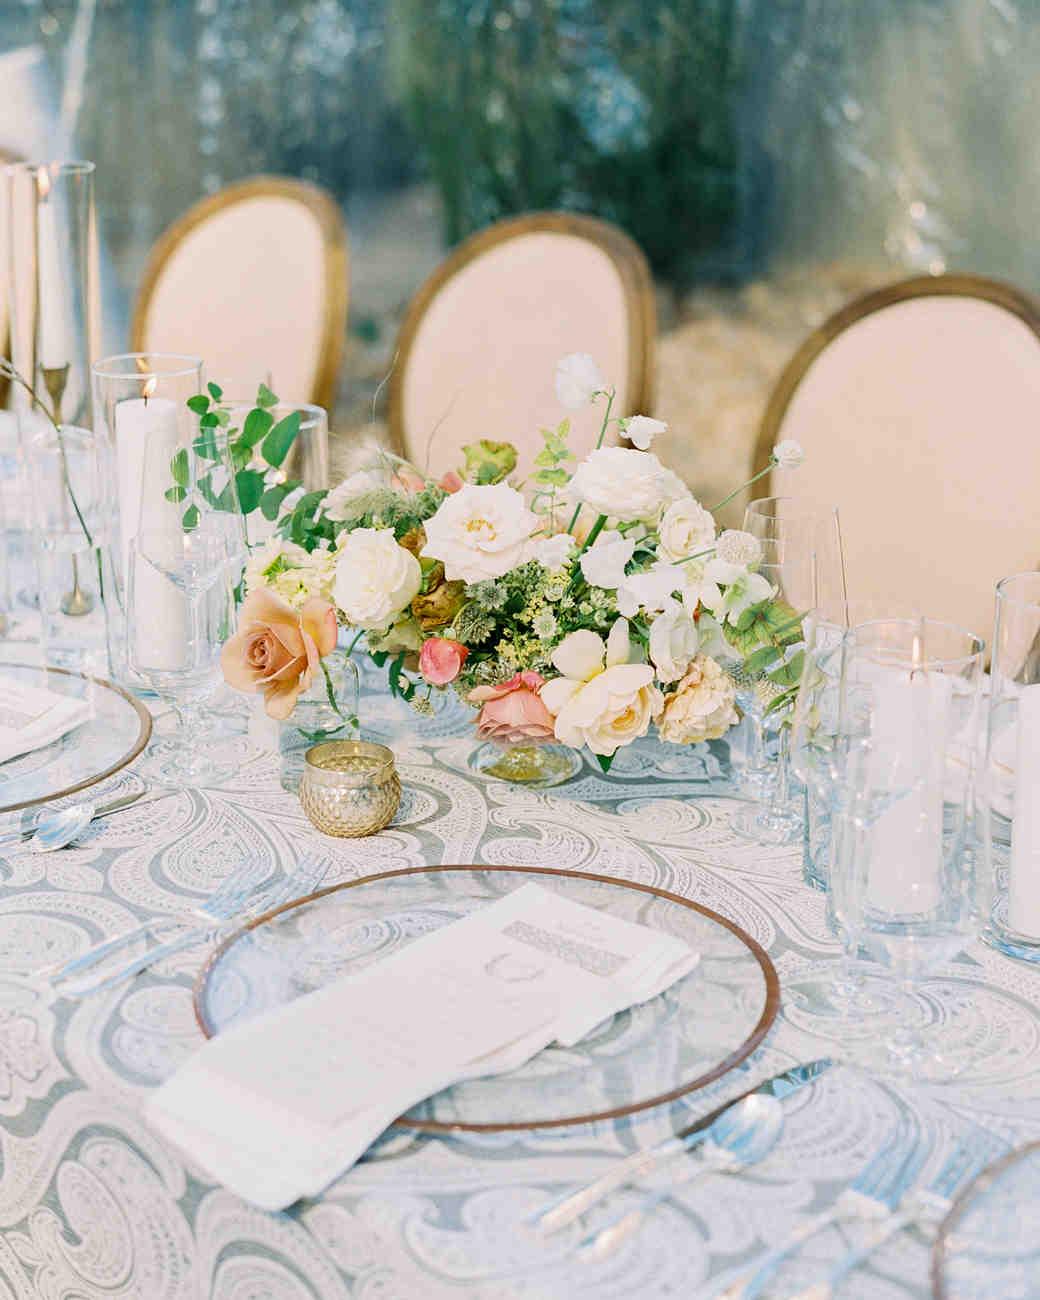 summer wedding classic centerpieces white rose floral arrangement